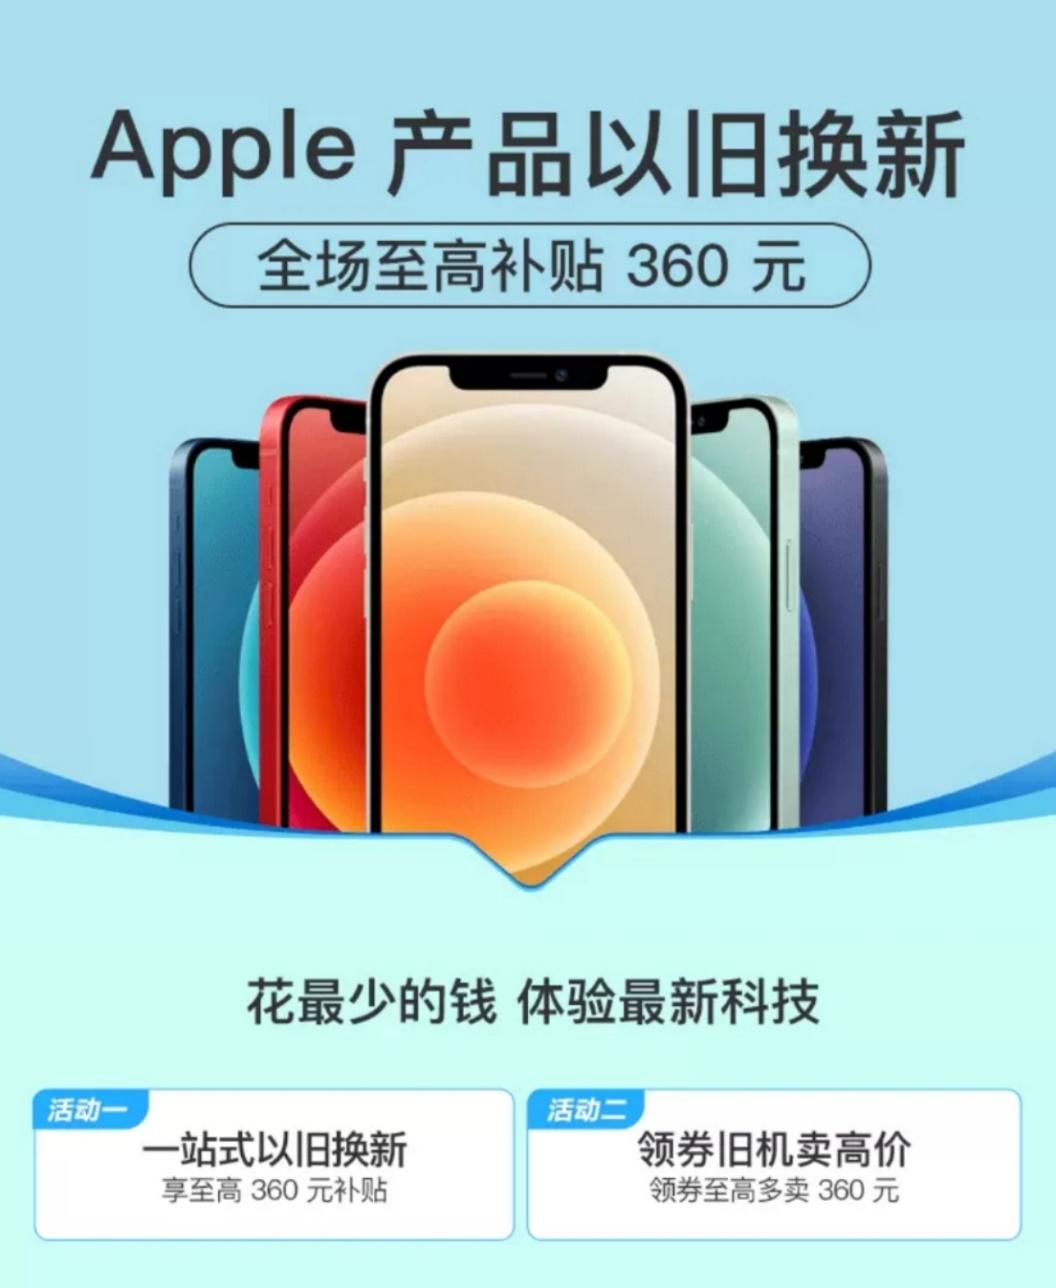 C:\Users\14042071\AppData\Local\Temp\WeChat Files\9b59fea815ad61e8f9006a9d44c2758.jpg